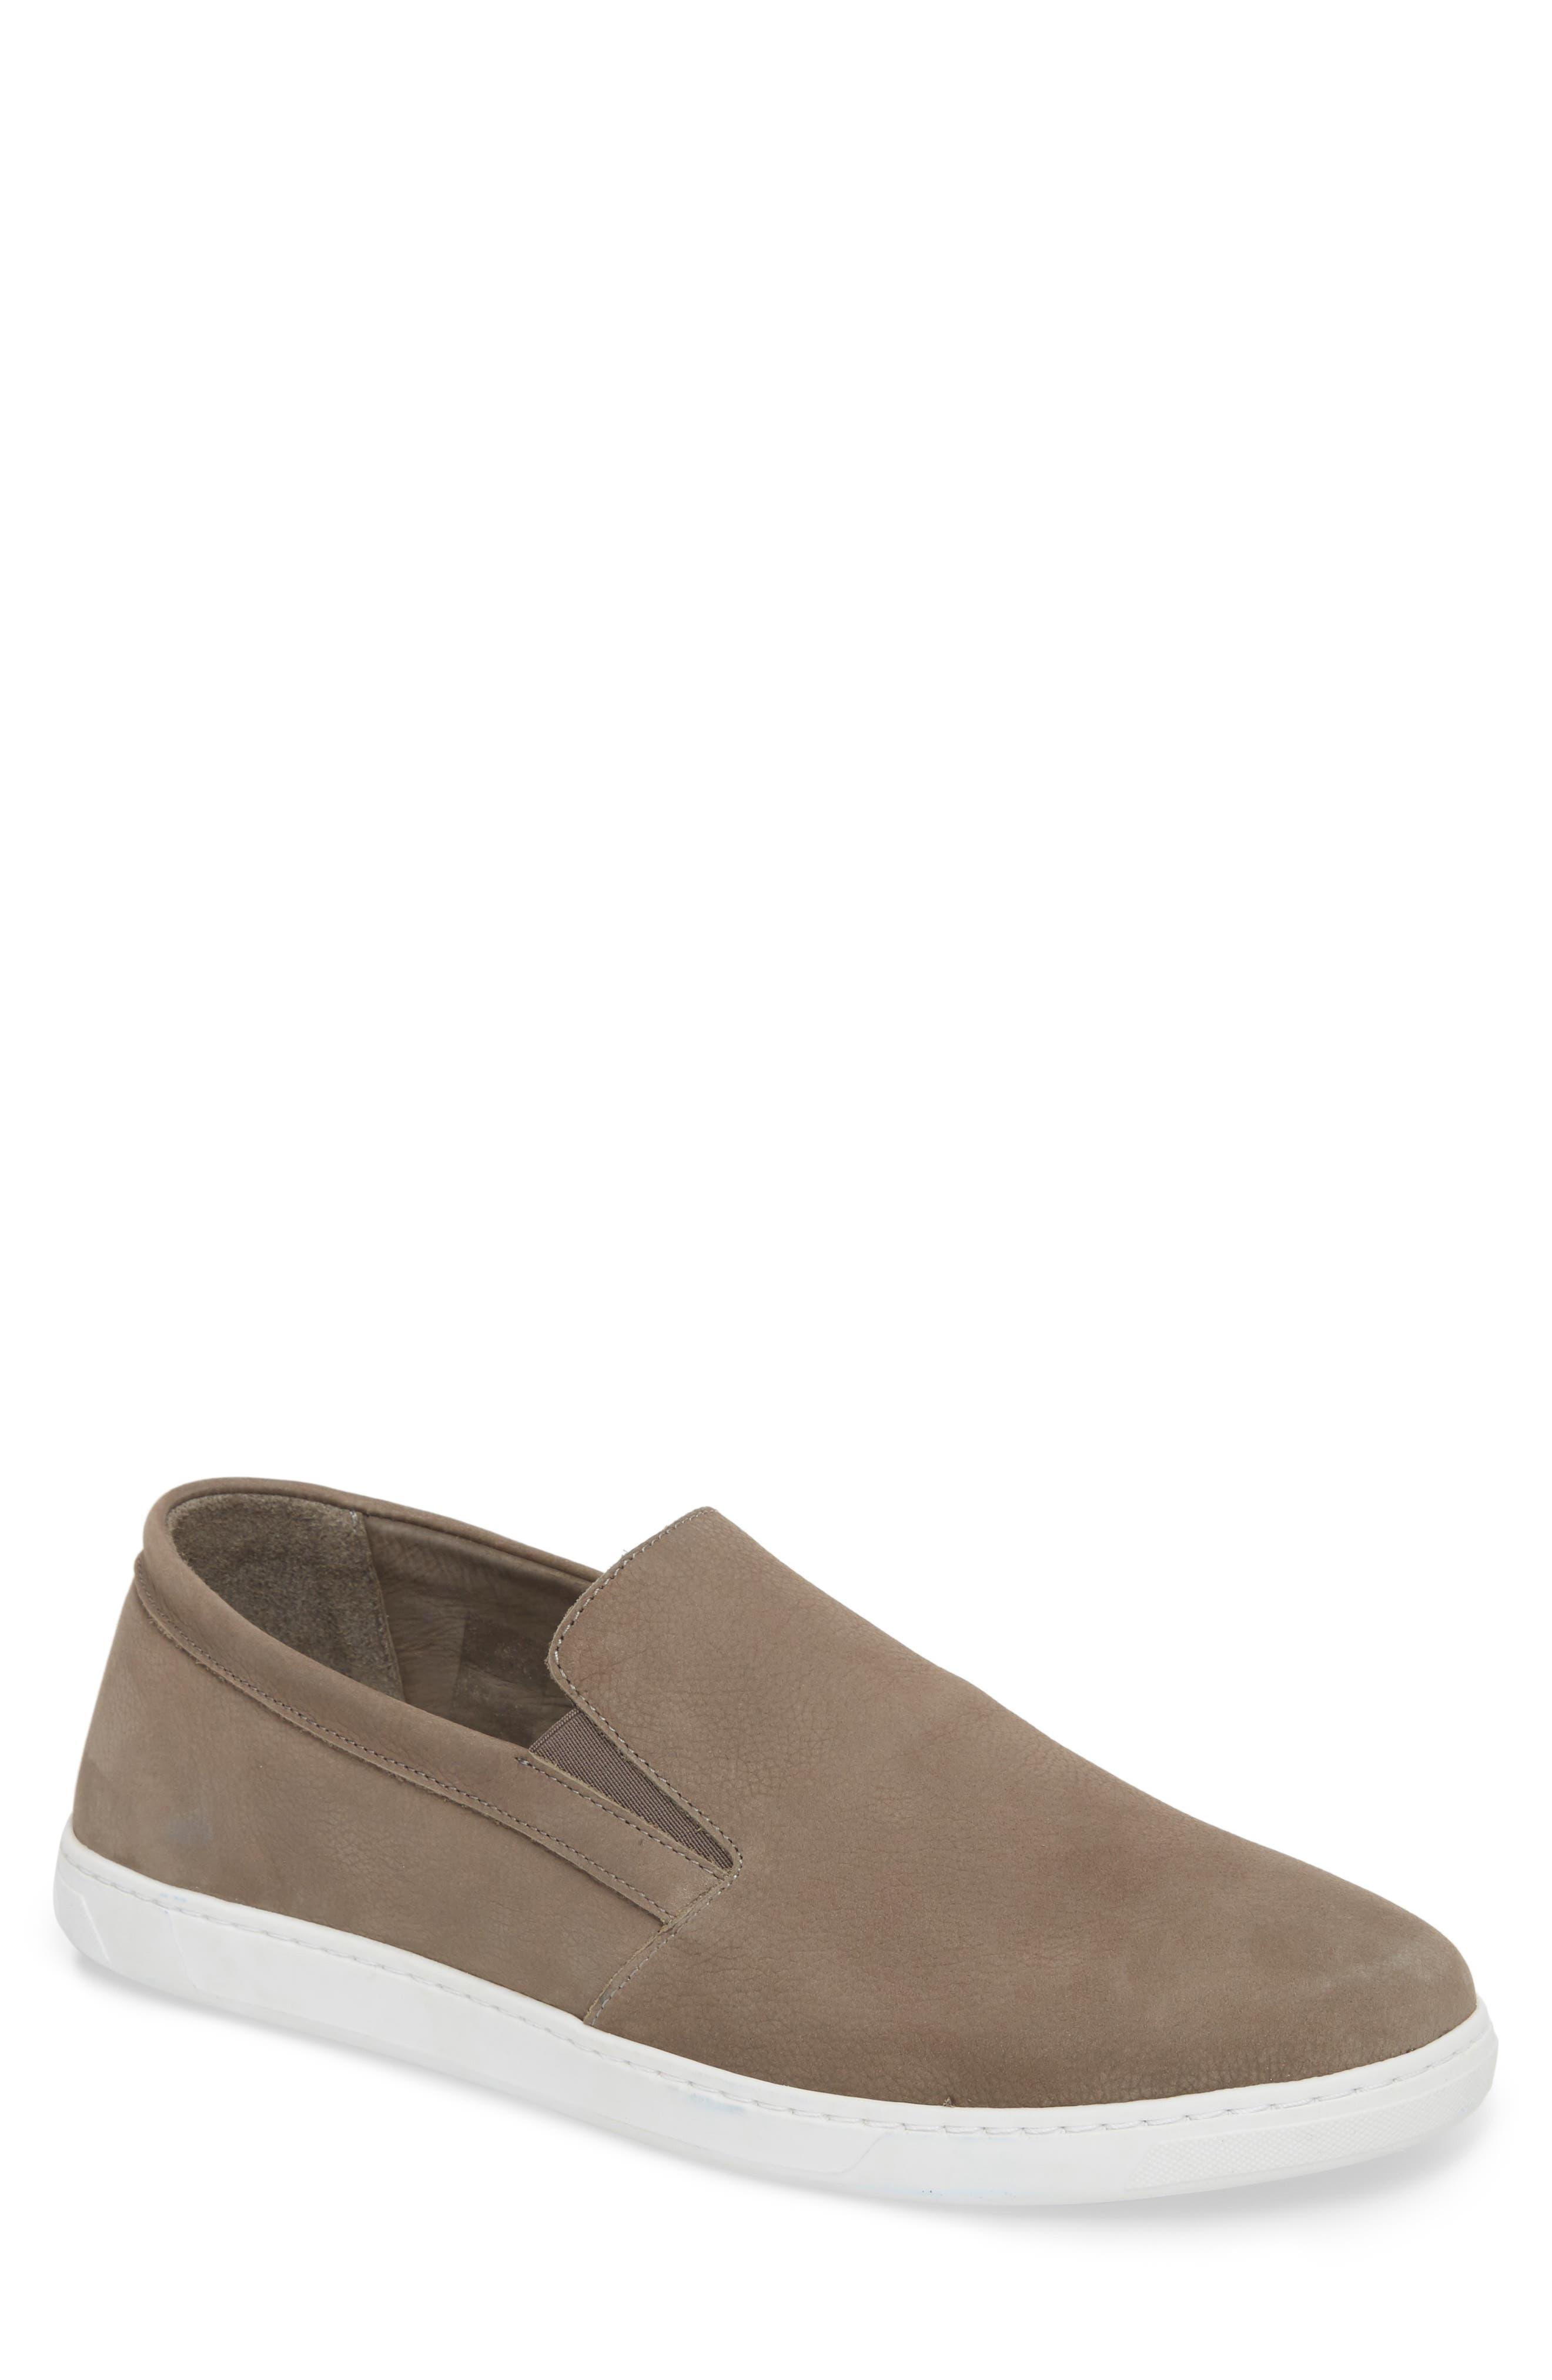 VINCE CAMUTO Neff Slip-On Sneaker, Main, color, DARK GREY LEATHER